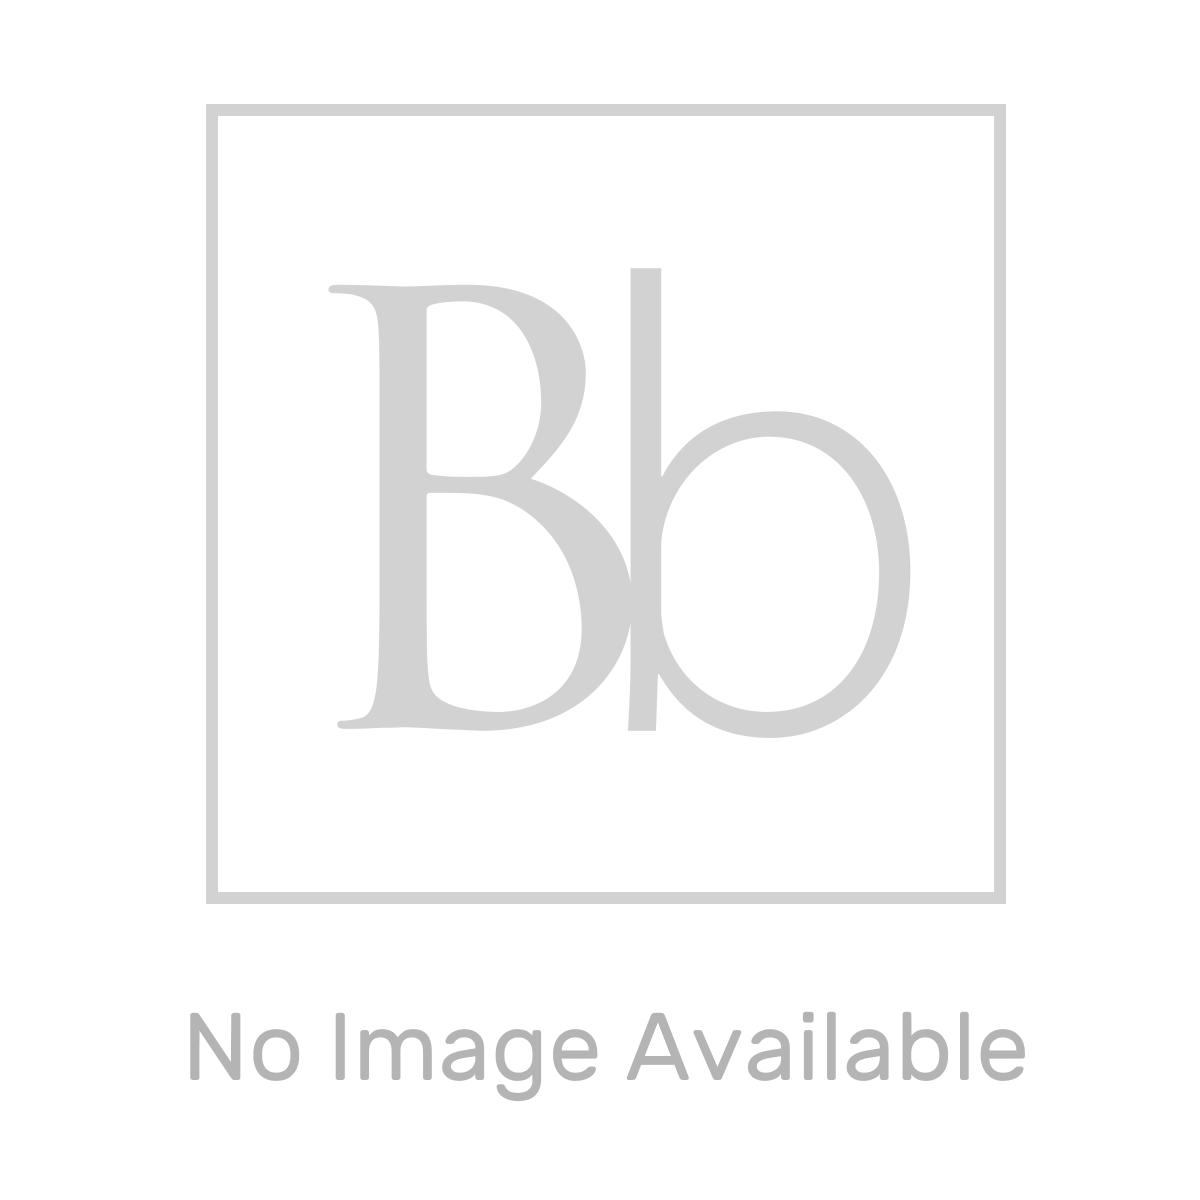 RAK Surface Matt Night Tile 300 x 600mm